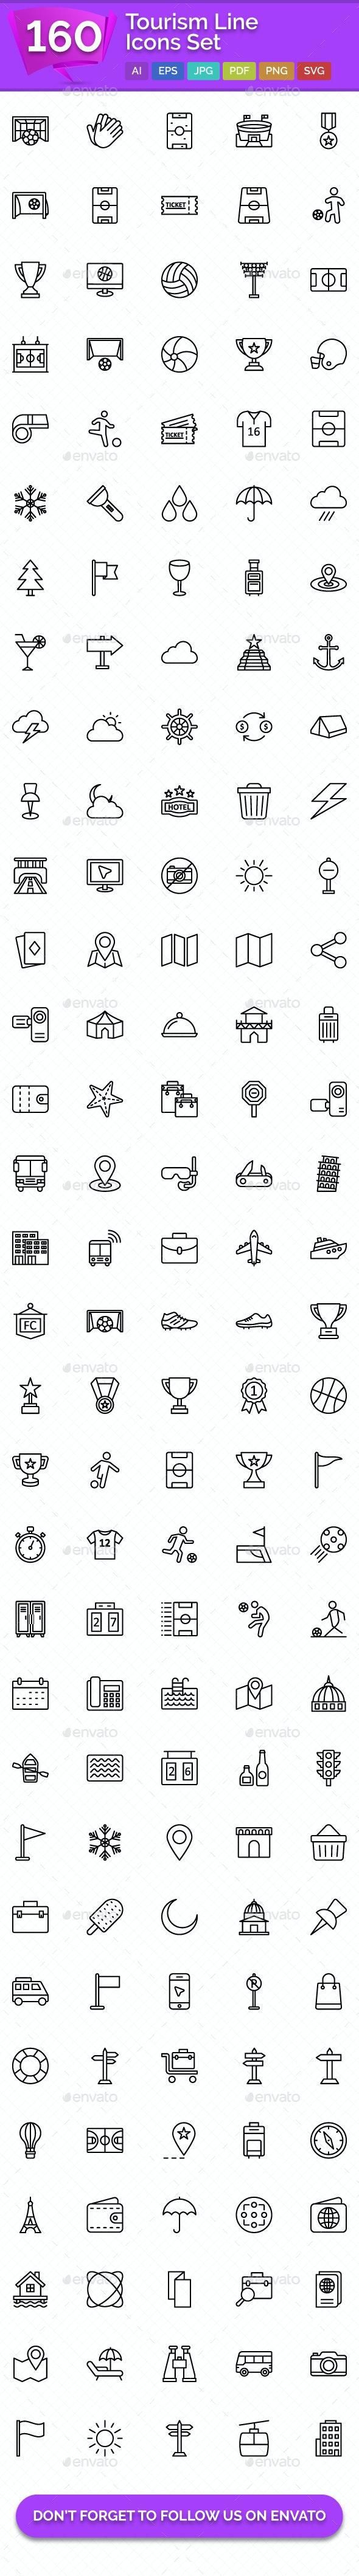 160 Tourism Line Icons Set - Icons